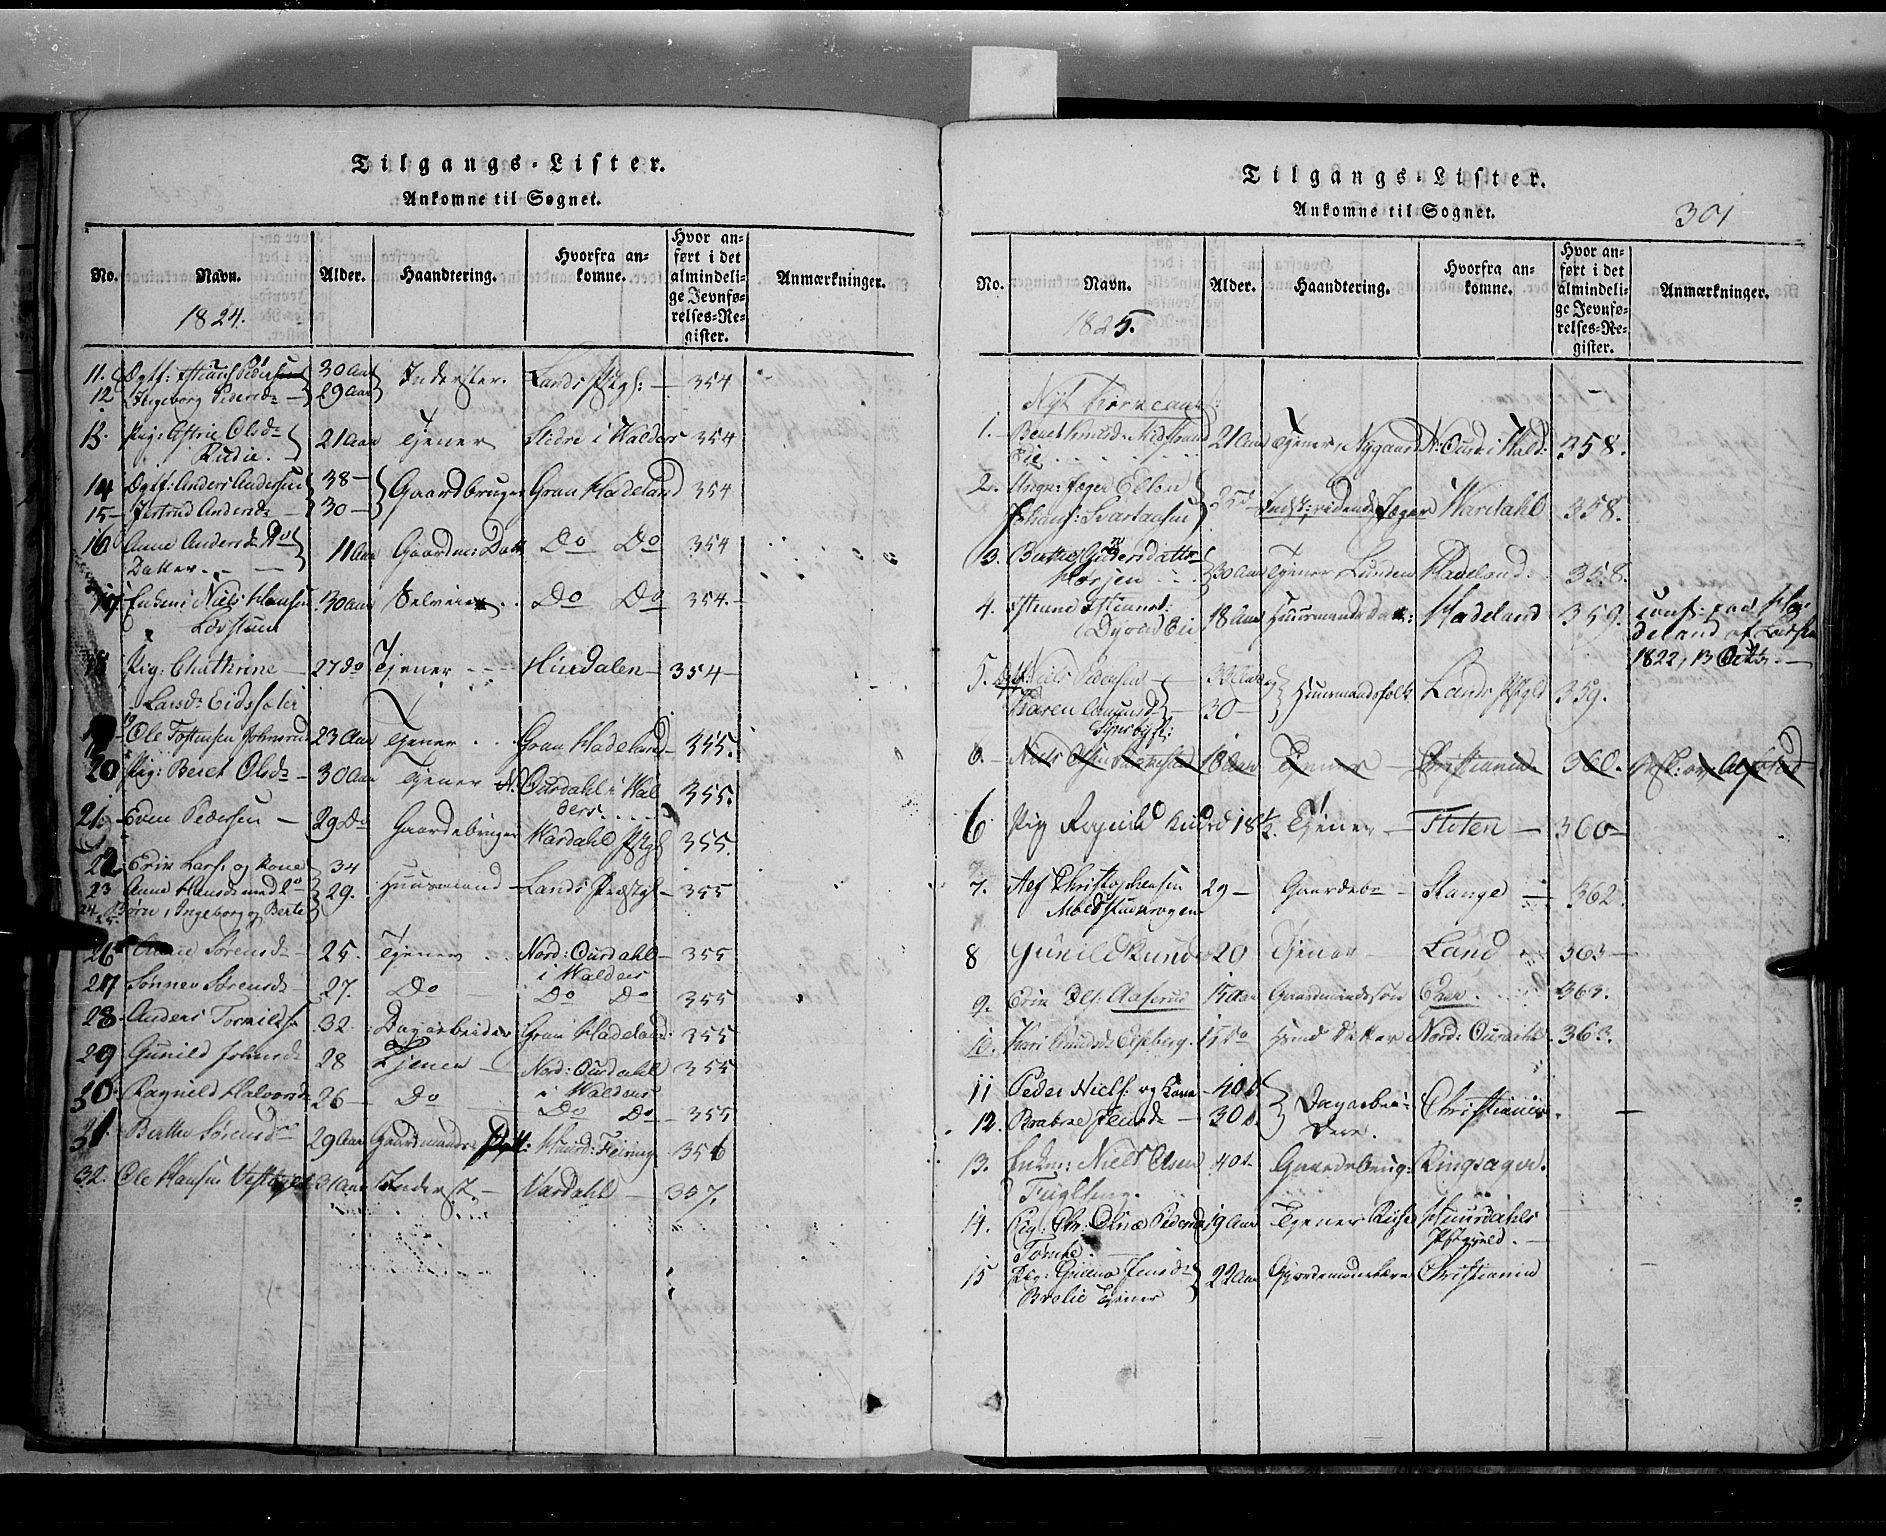 SAH, Toten prestekontor, Klokkerbok nr. 2, 1820-1827, s. 301